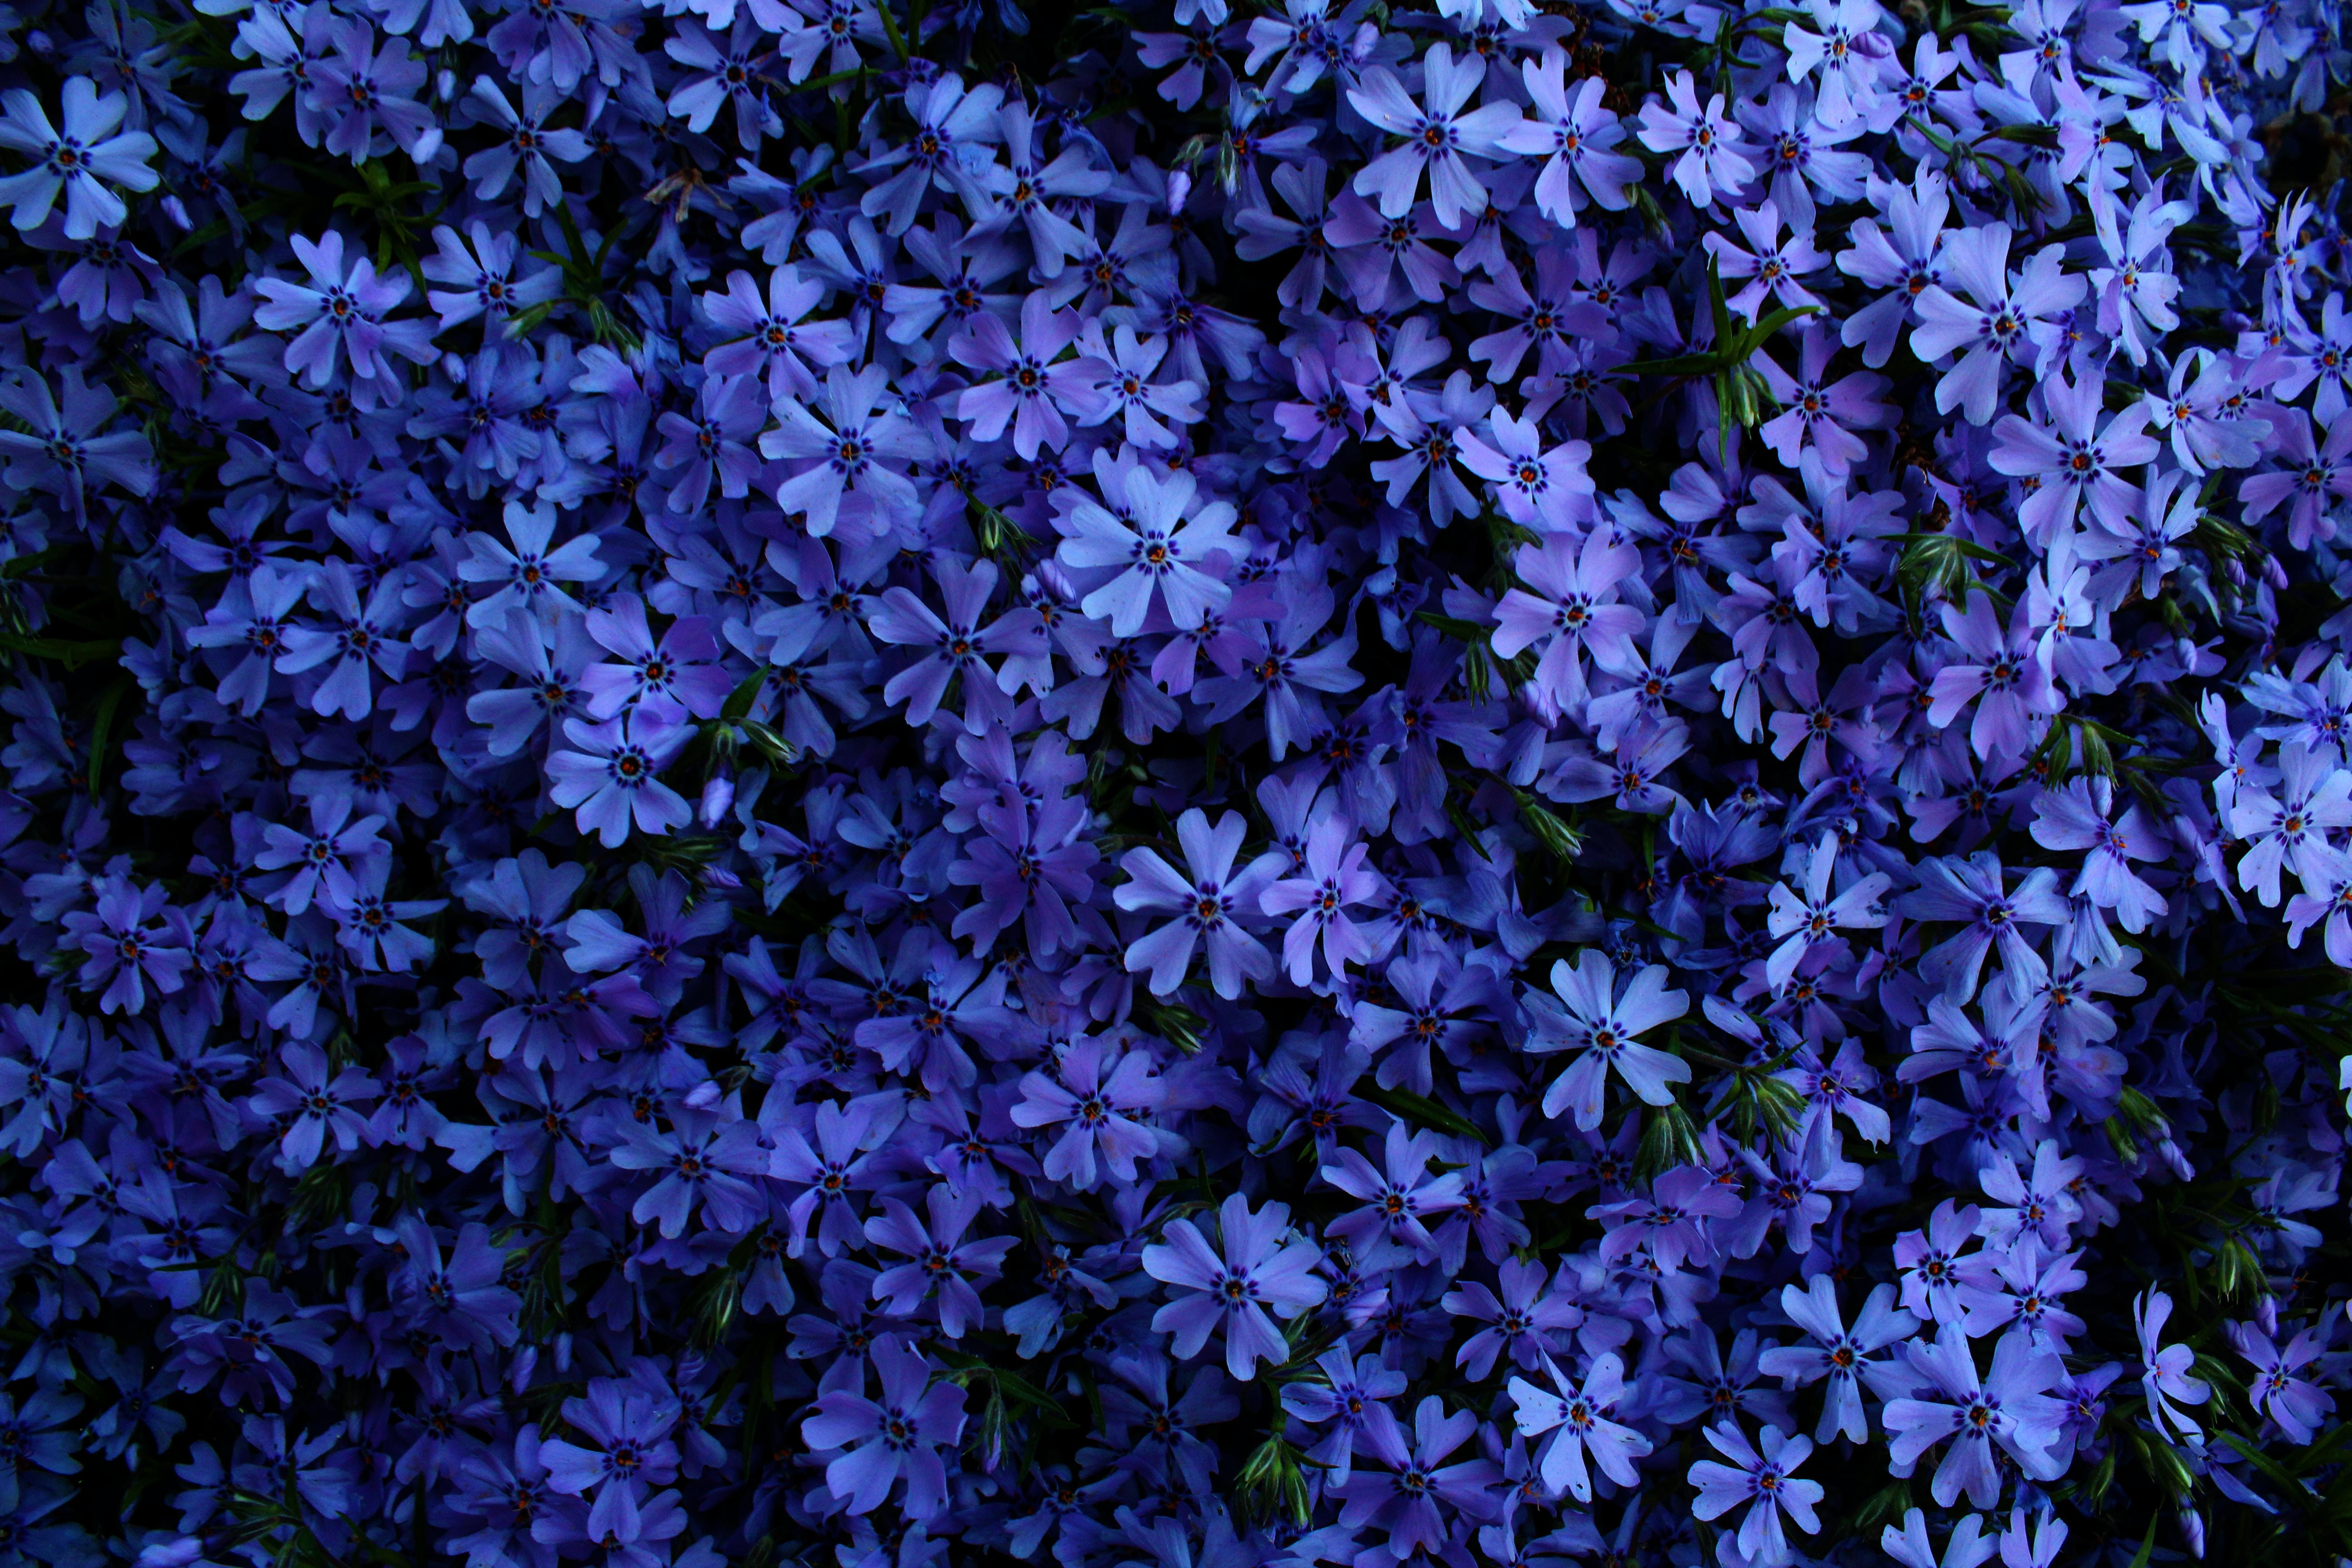 photo of blue petaled floweres